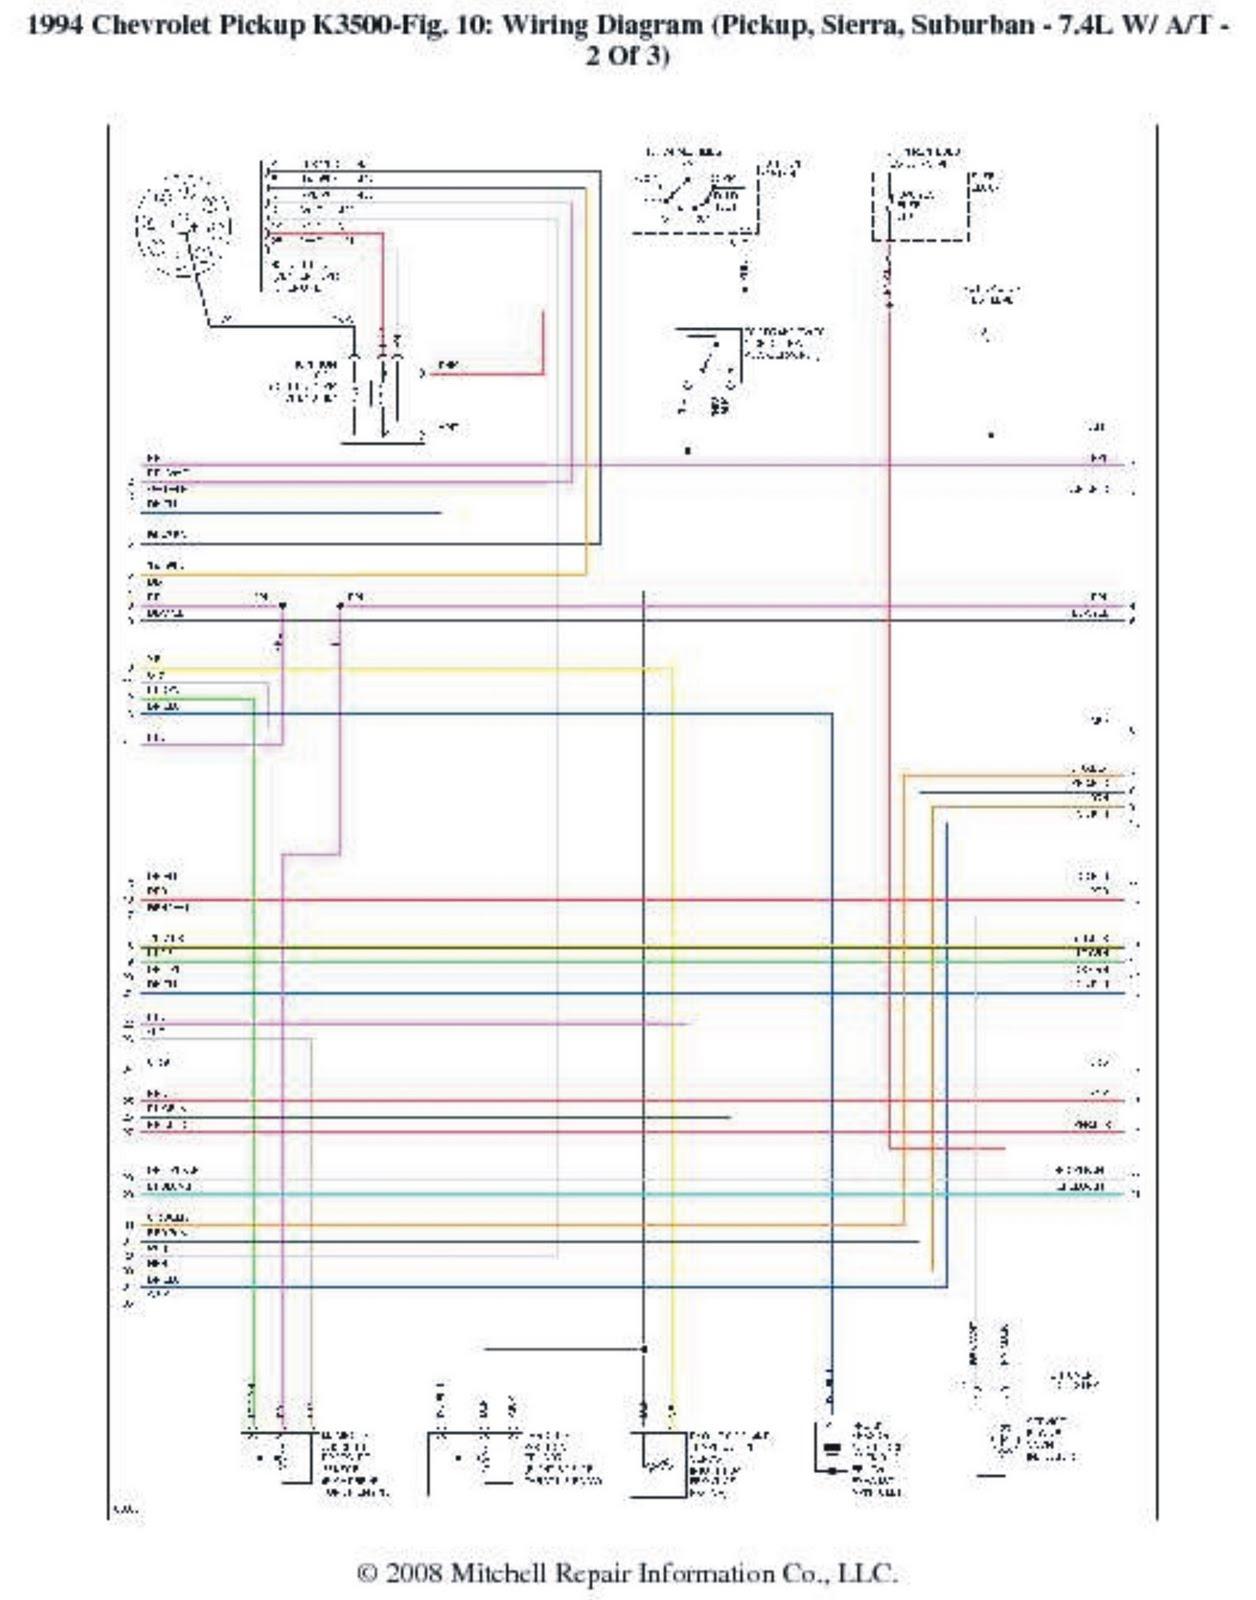 Honda Outboard Wiring Diagram Bf115 Ambulance Ford F-350 Wiring Diagram